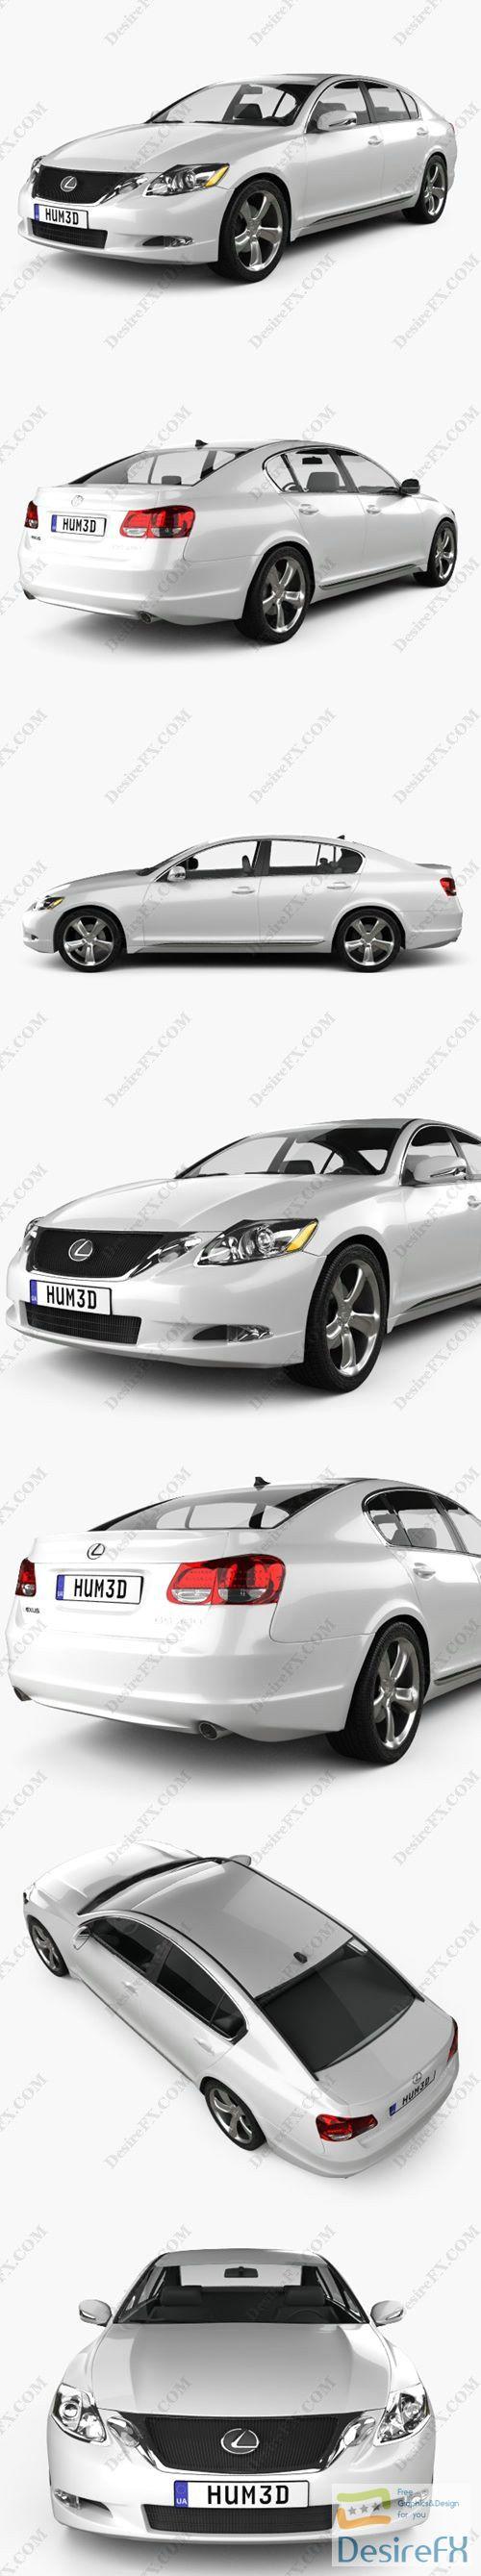 Lexus GS 2010 3D Model